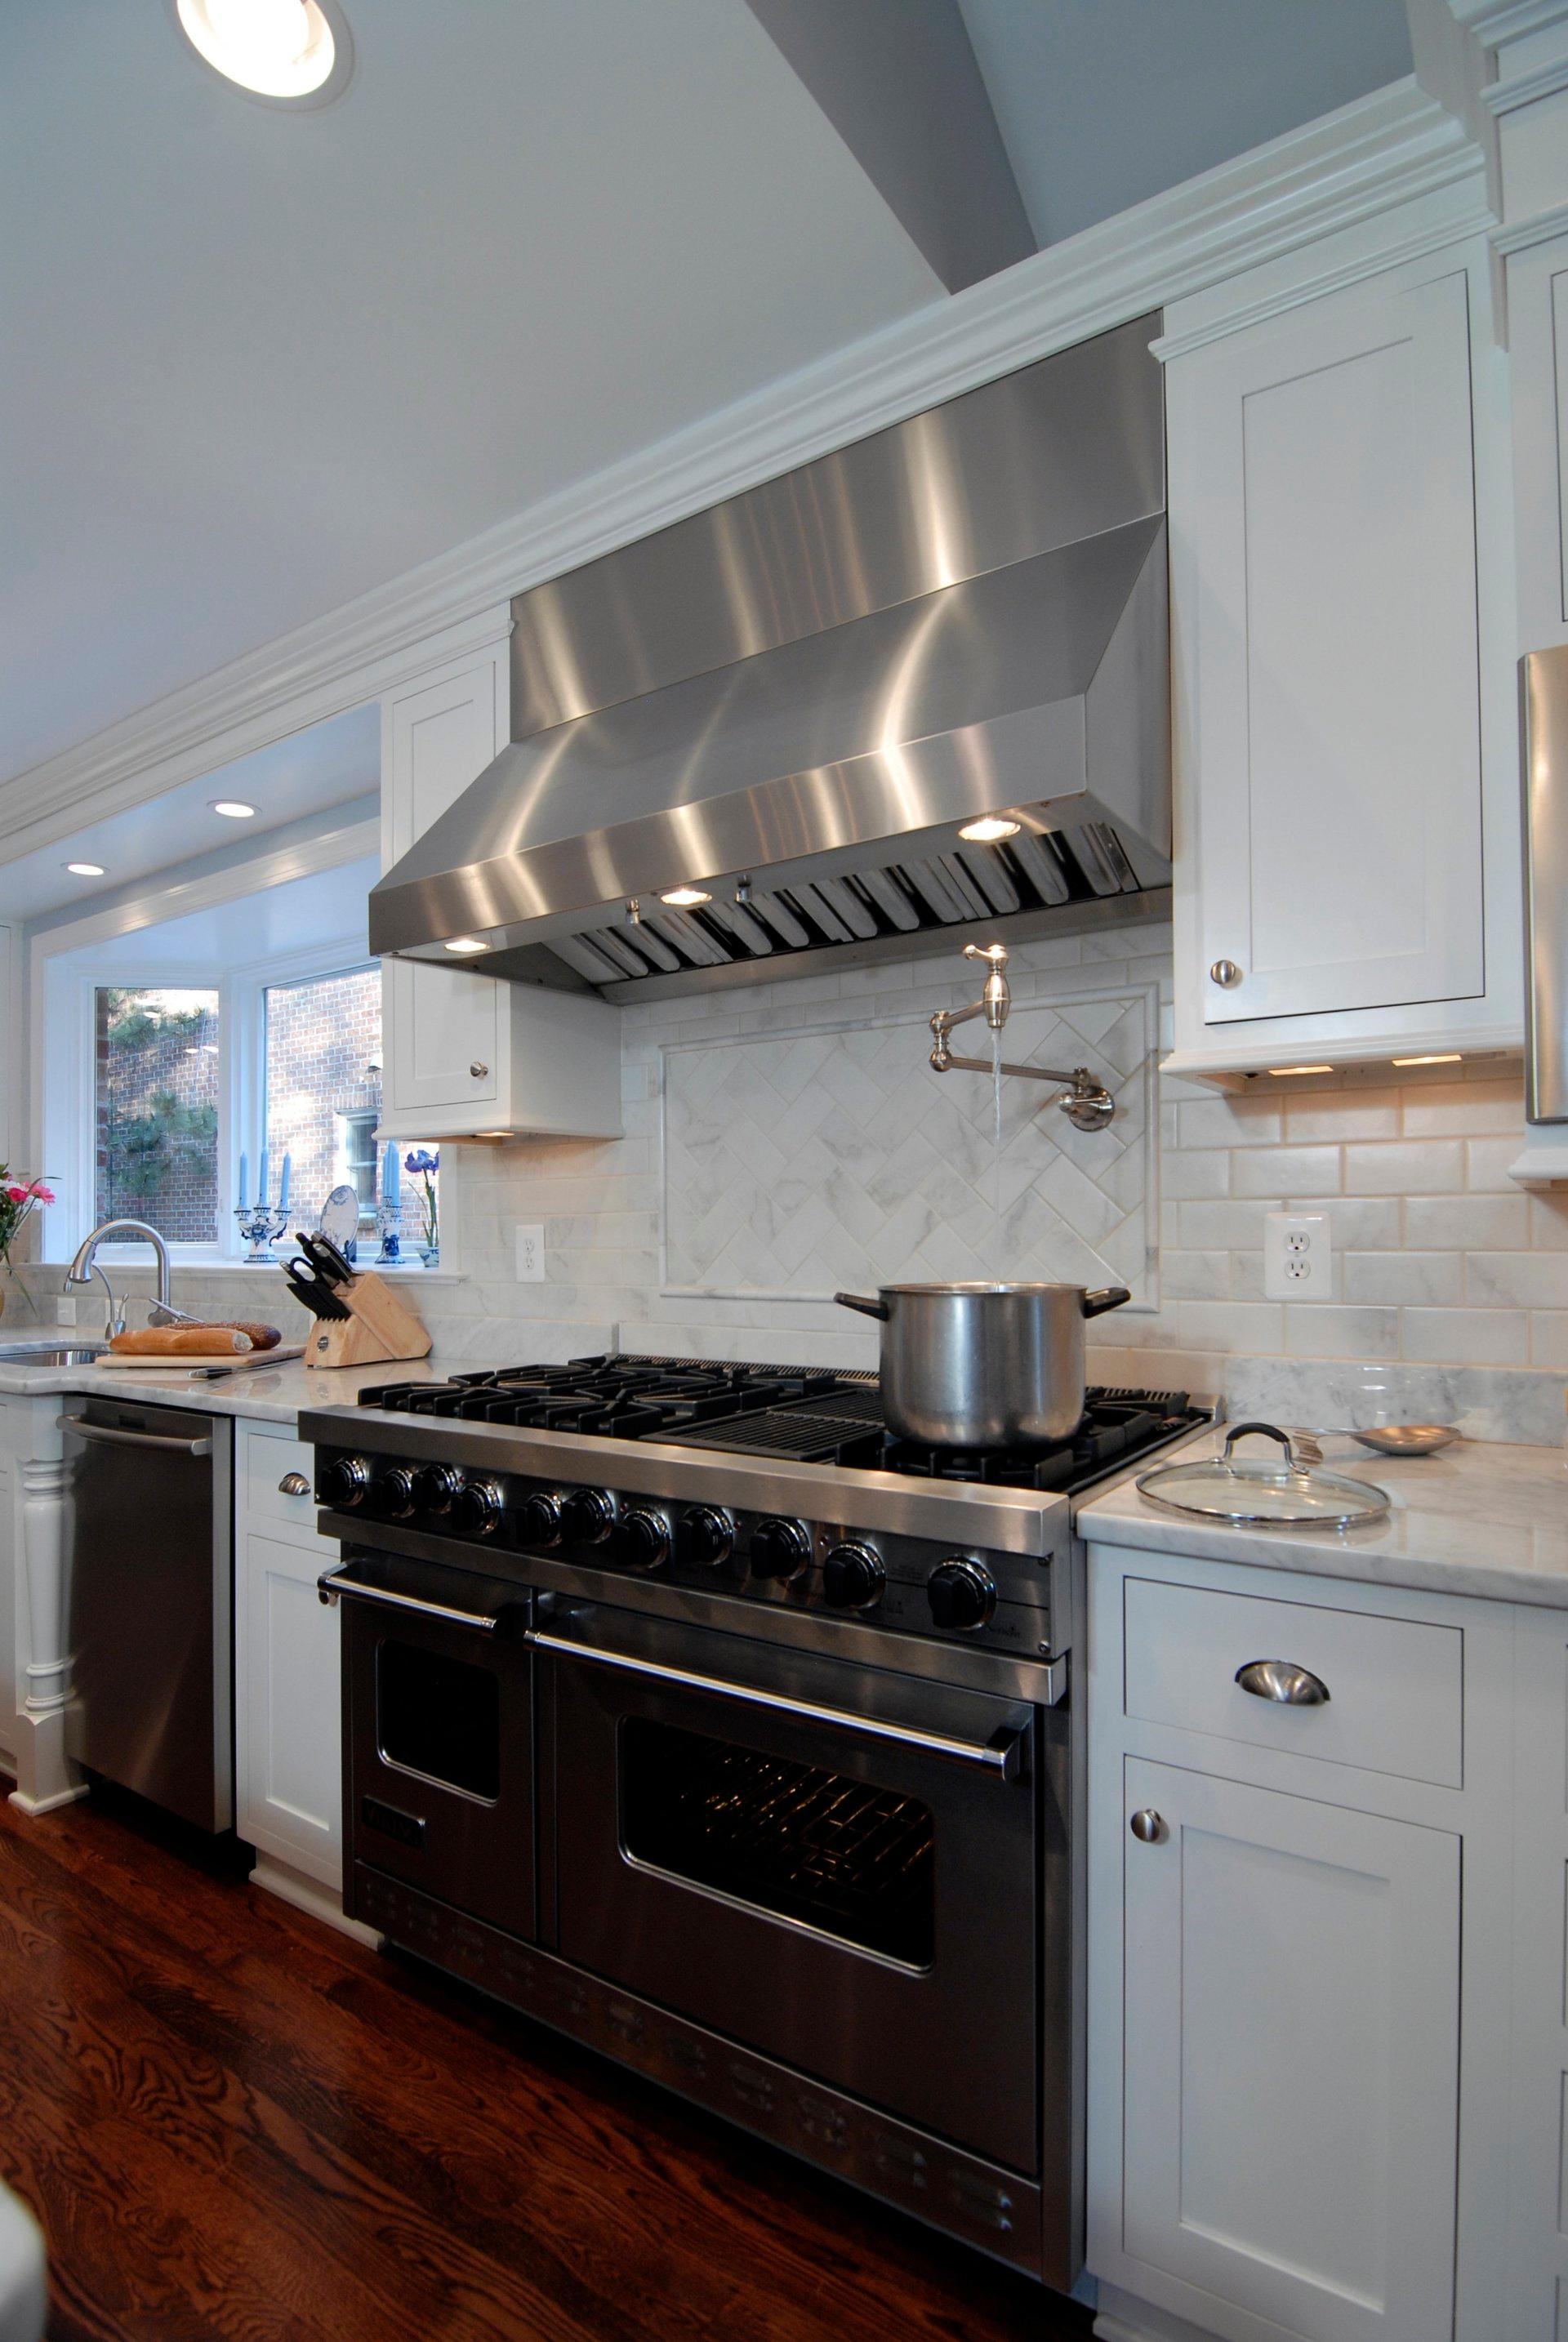 Terranova Construction Kitchen & Bath image 7